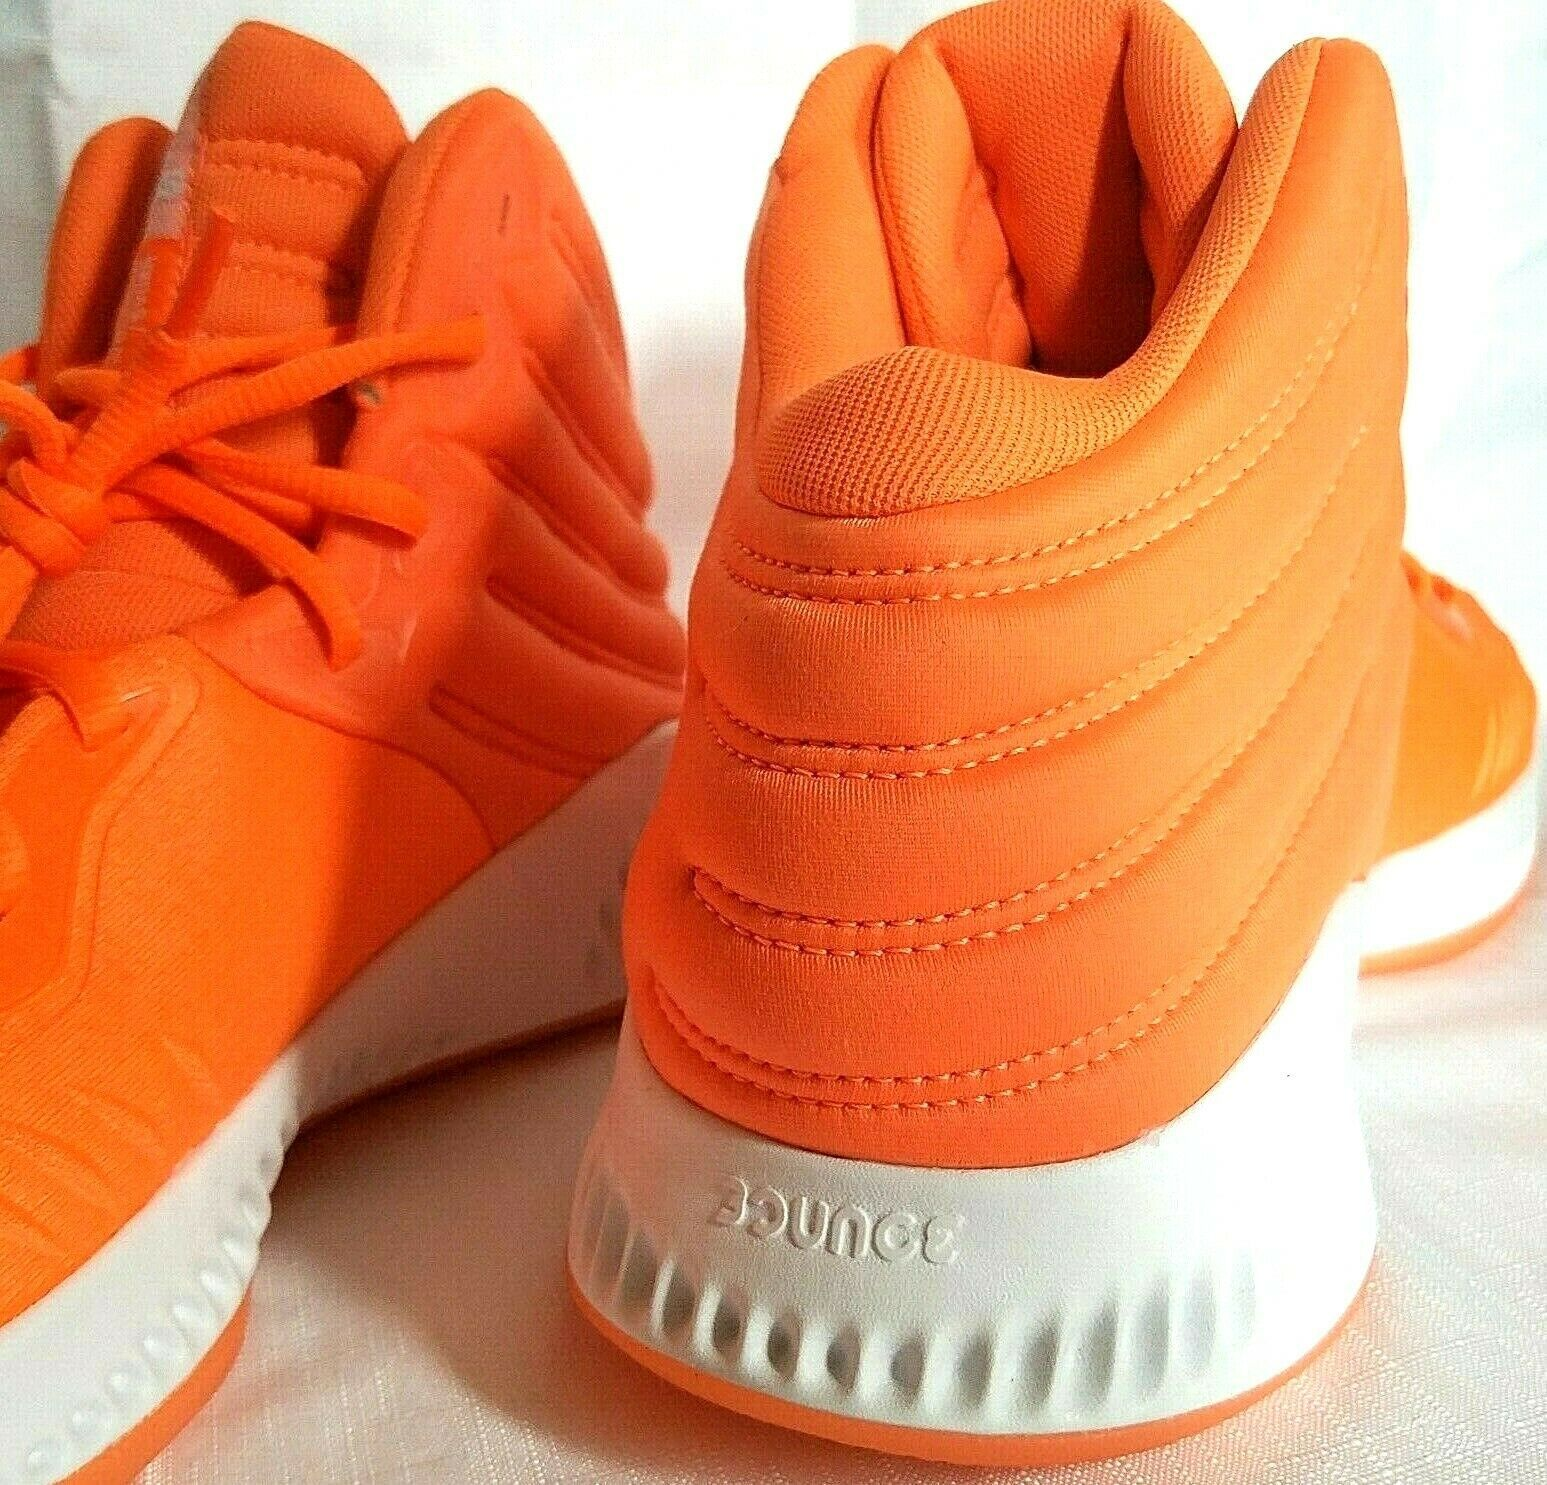 adidas SM Mad Bounce Mens 12.5 D97371 Basketball Shoes Orange & White 2018 image 4